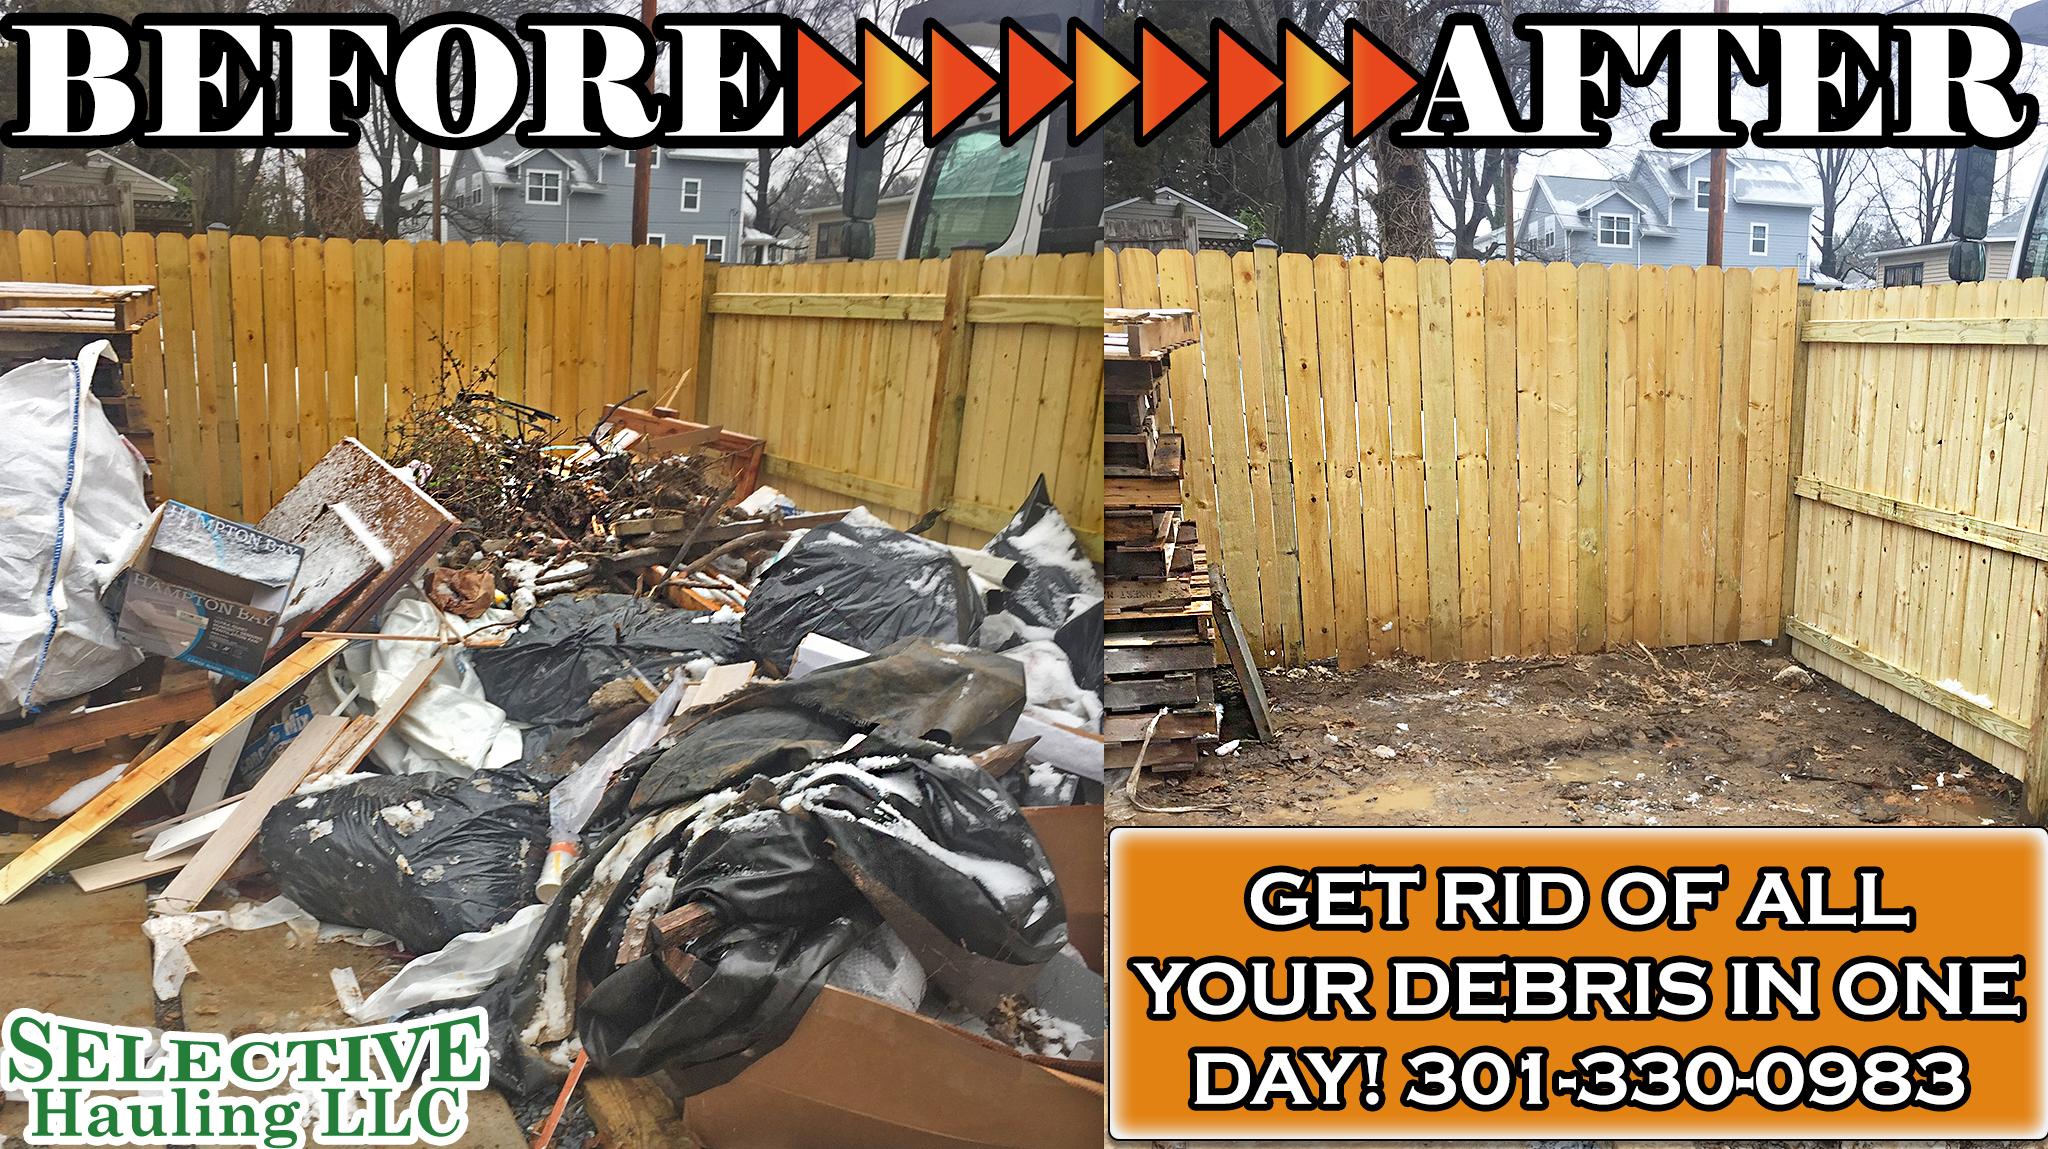 junk removal service Burke Virginia